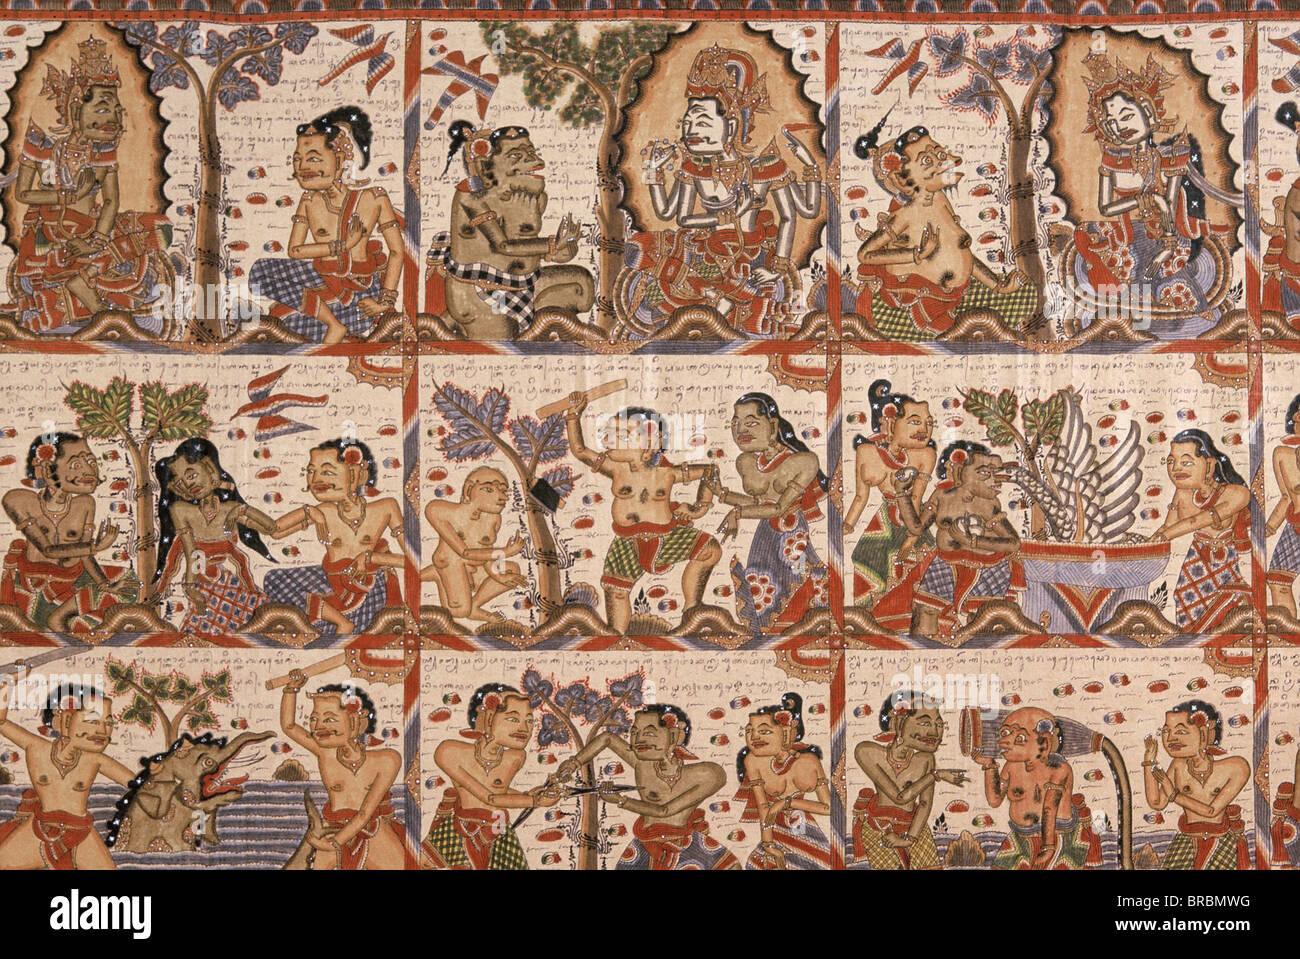 Balinese calendar, Bali, Indonesia - Stock Image